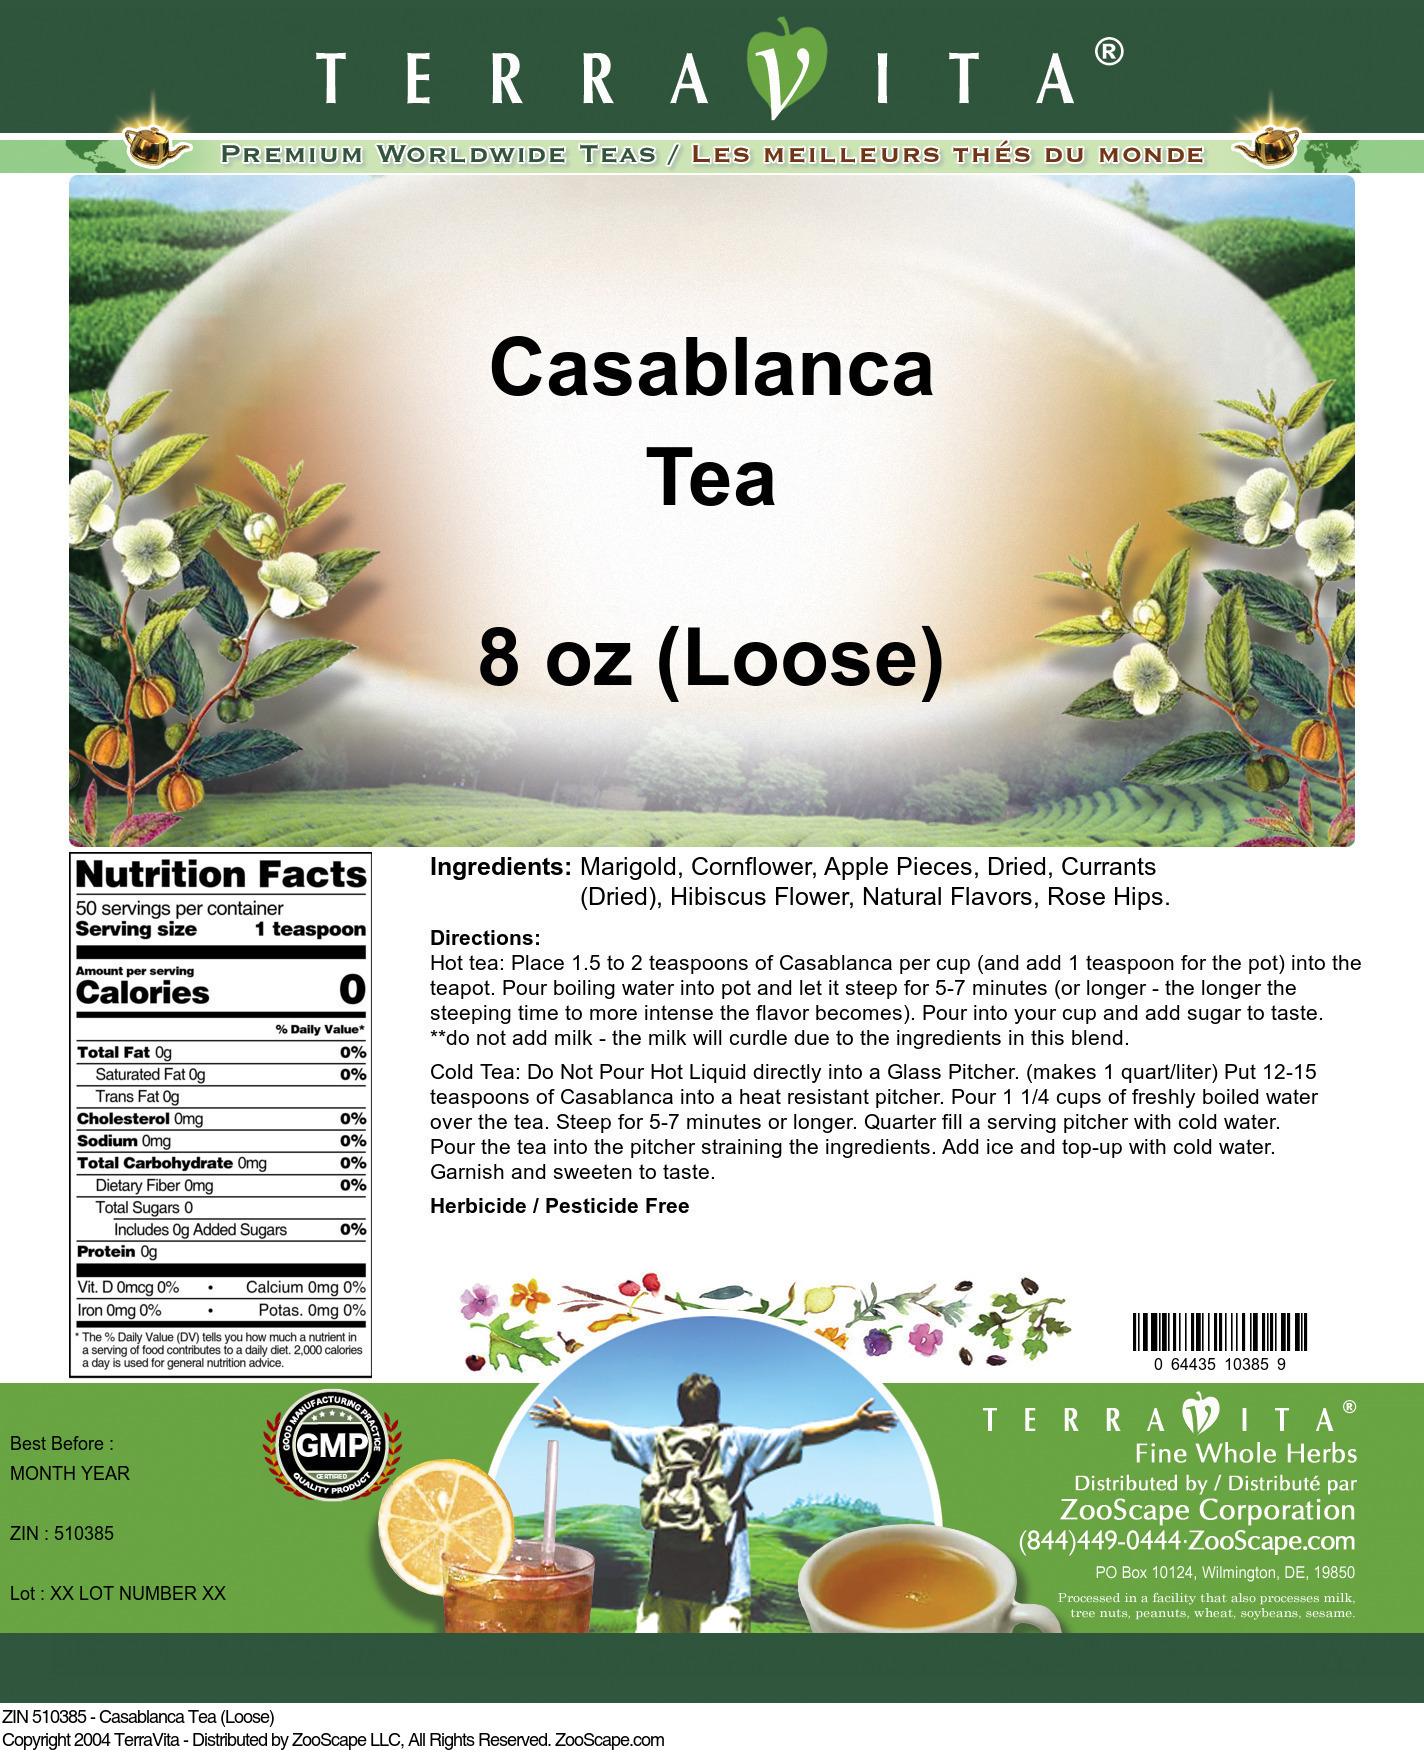 Casablanca Tea (Loose)